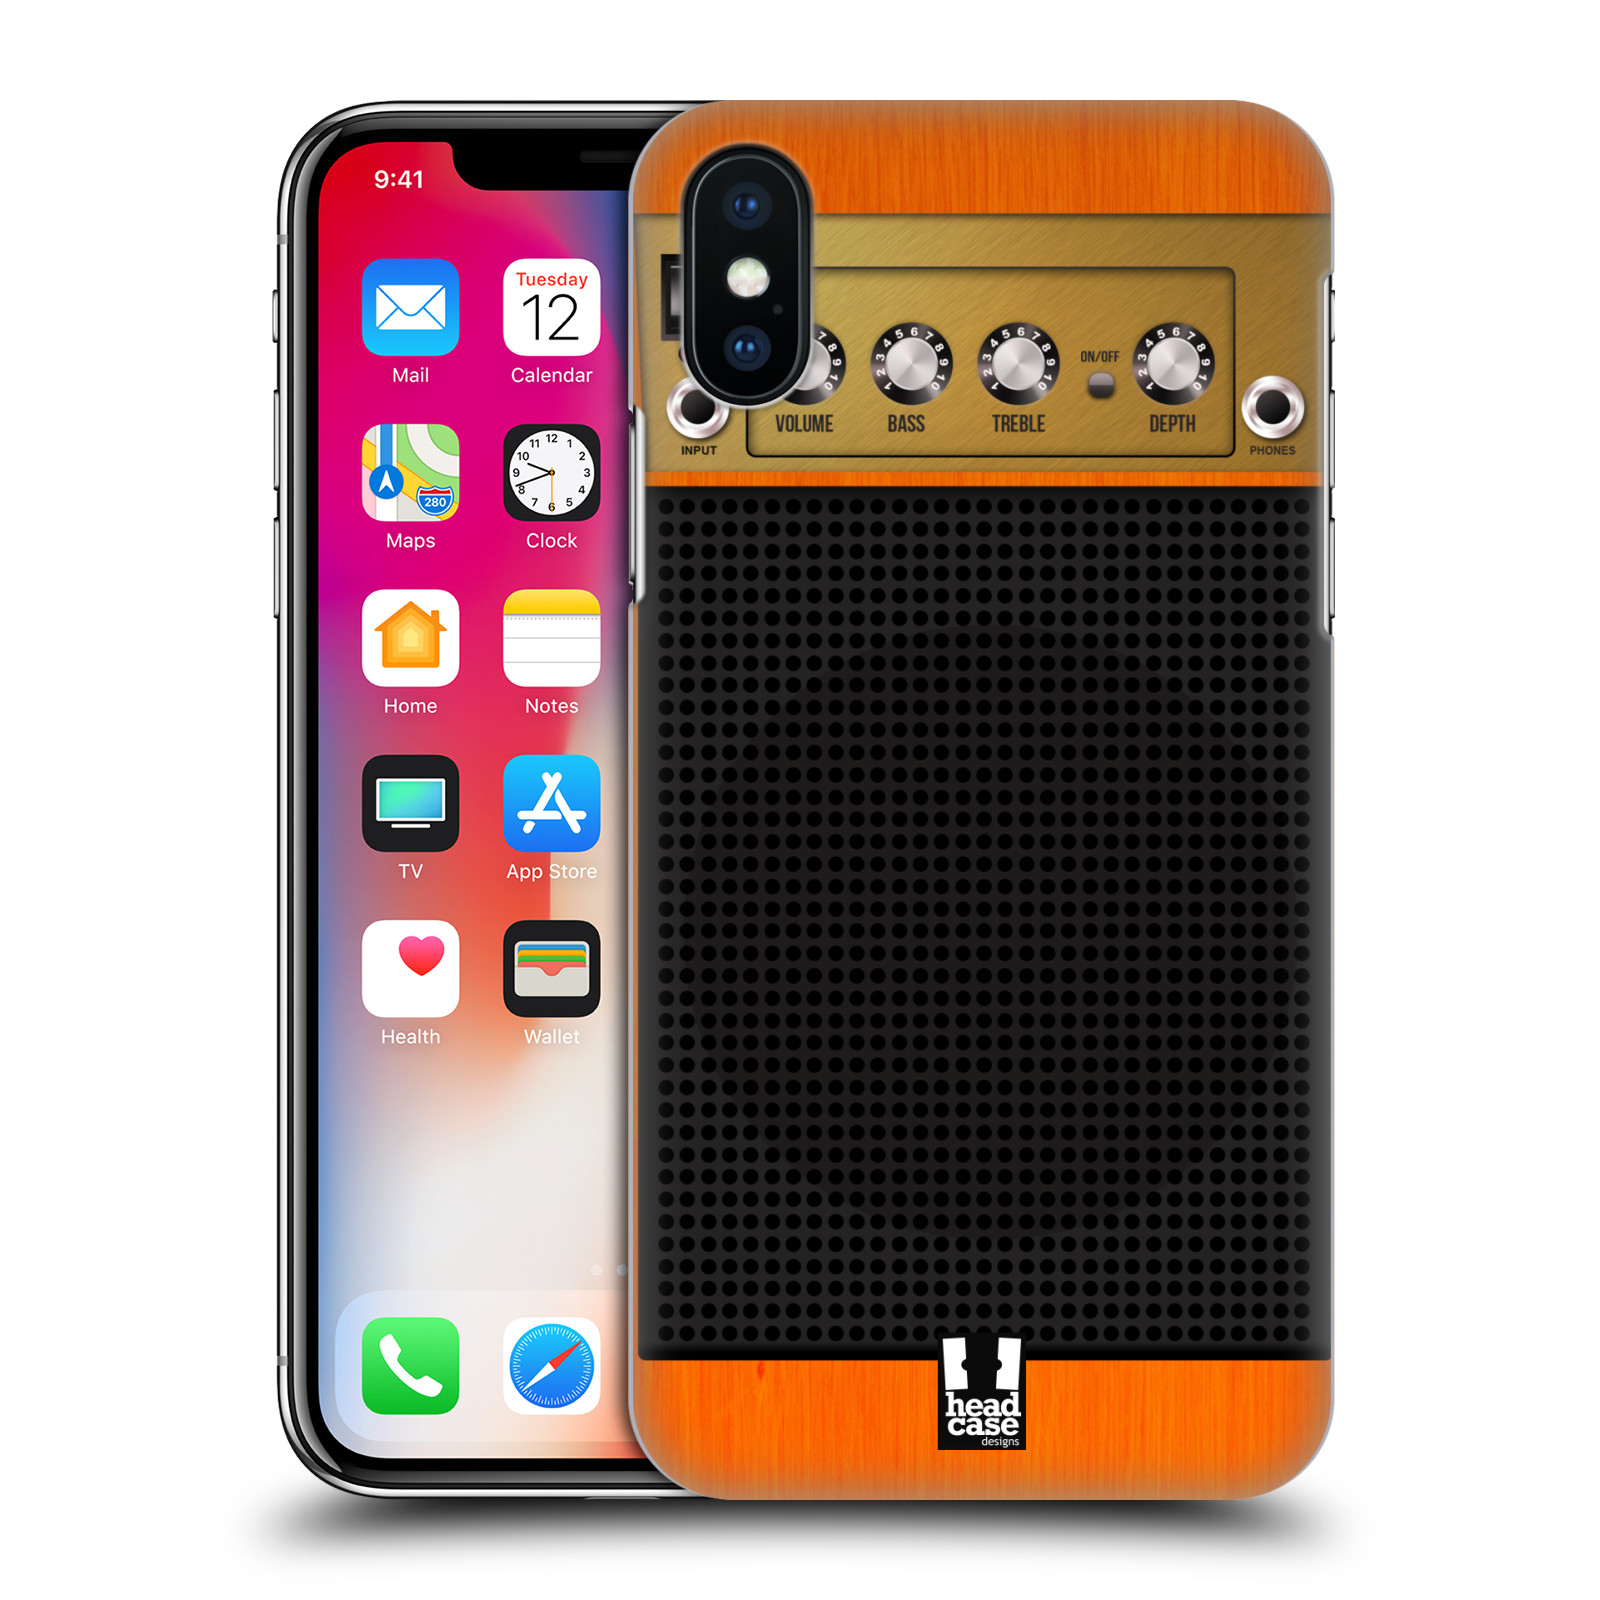 HEAD-CASE-DESIGNS-GUITAR-AMP-HARD-BACK-CASE-FOR-APPLE-iPHONE-X